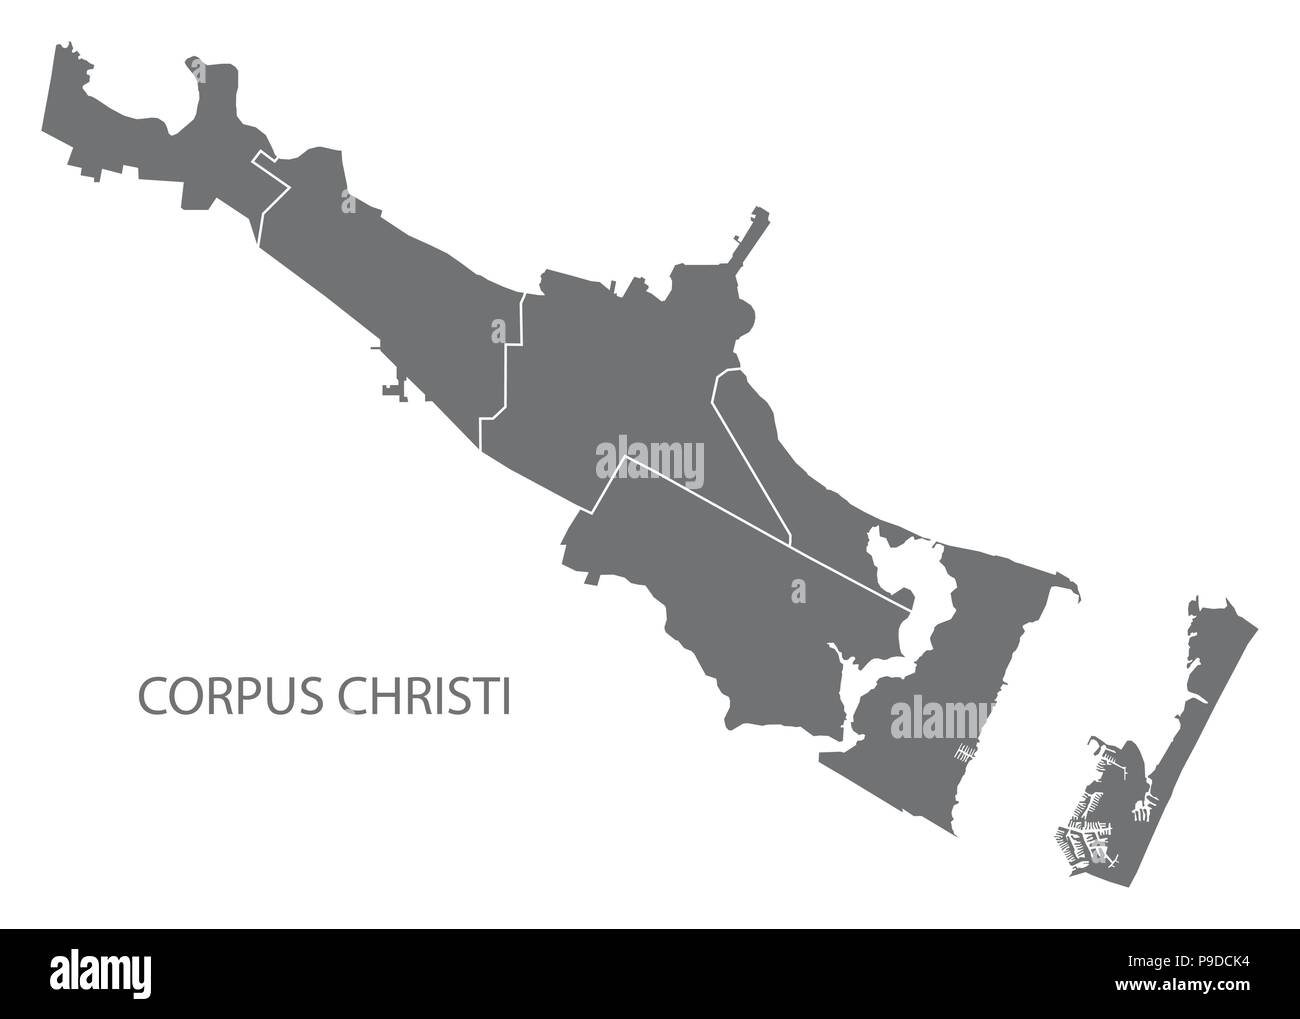 Corpus Christi Texas city map with neighborhoods grey illustration silhouette shape - Stock Image